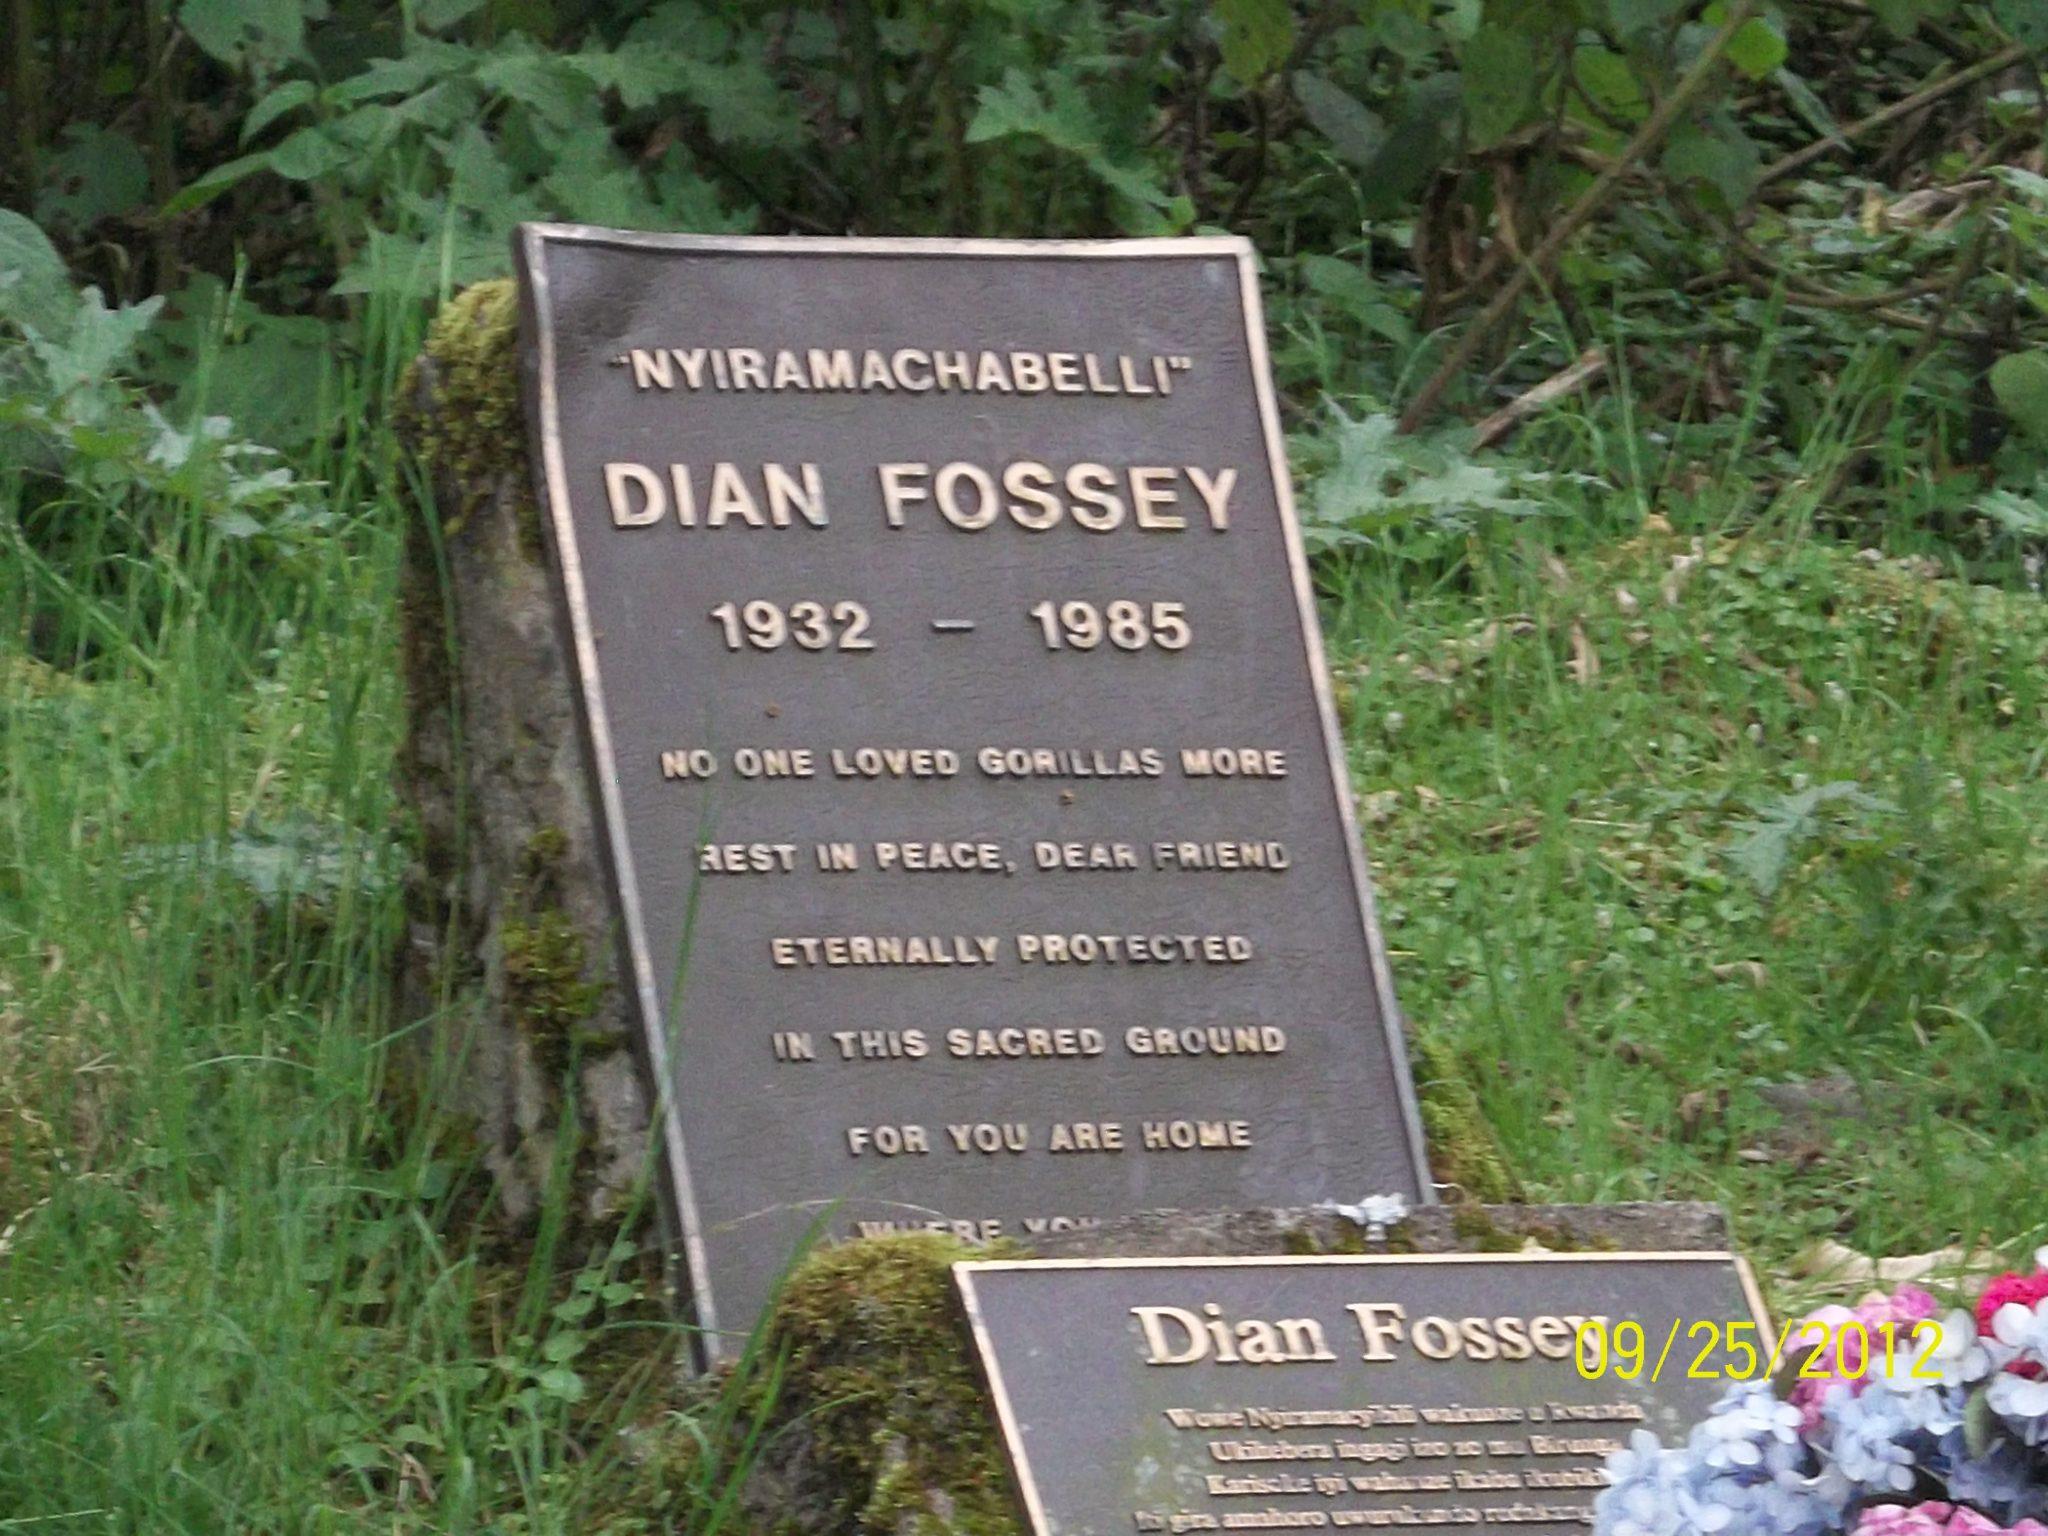 Visit to Dian Fossey Grave in Volcanoes National Park-Rwanda